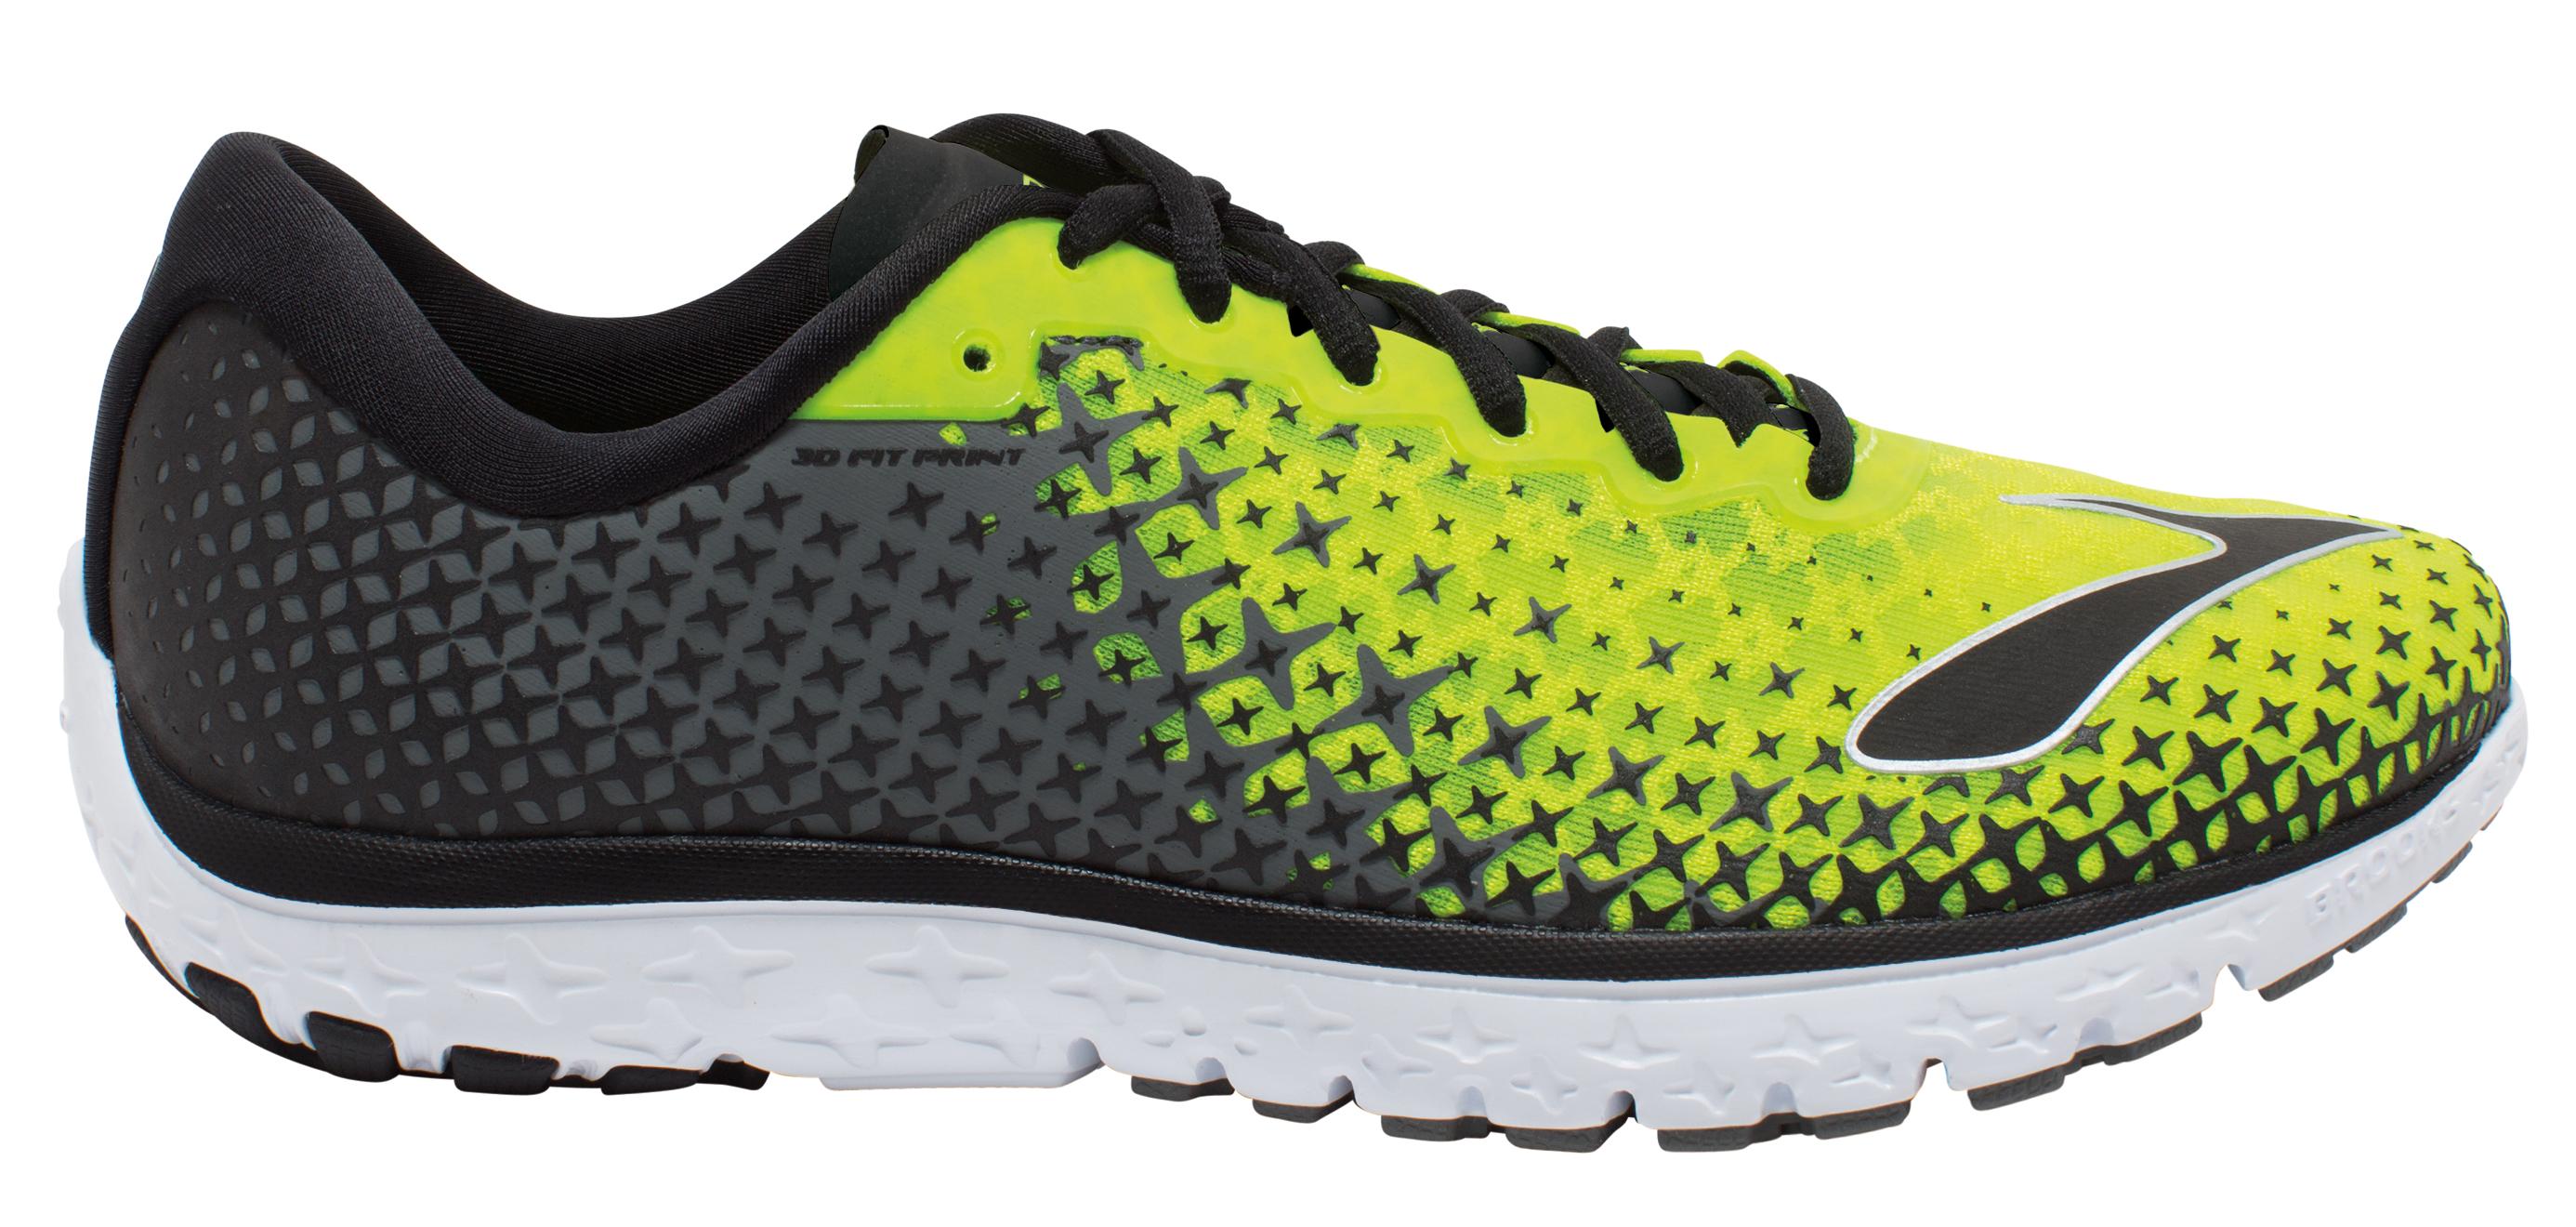 e665c04a5e691 Brooks PureFlow 5 Road Run Shoes - Men s